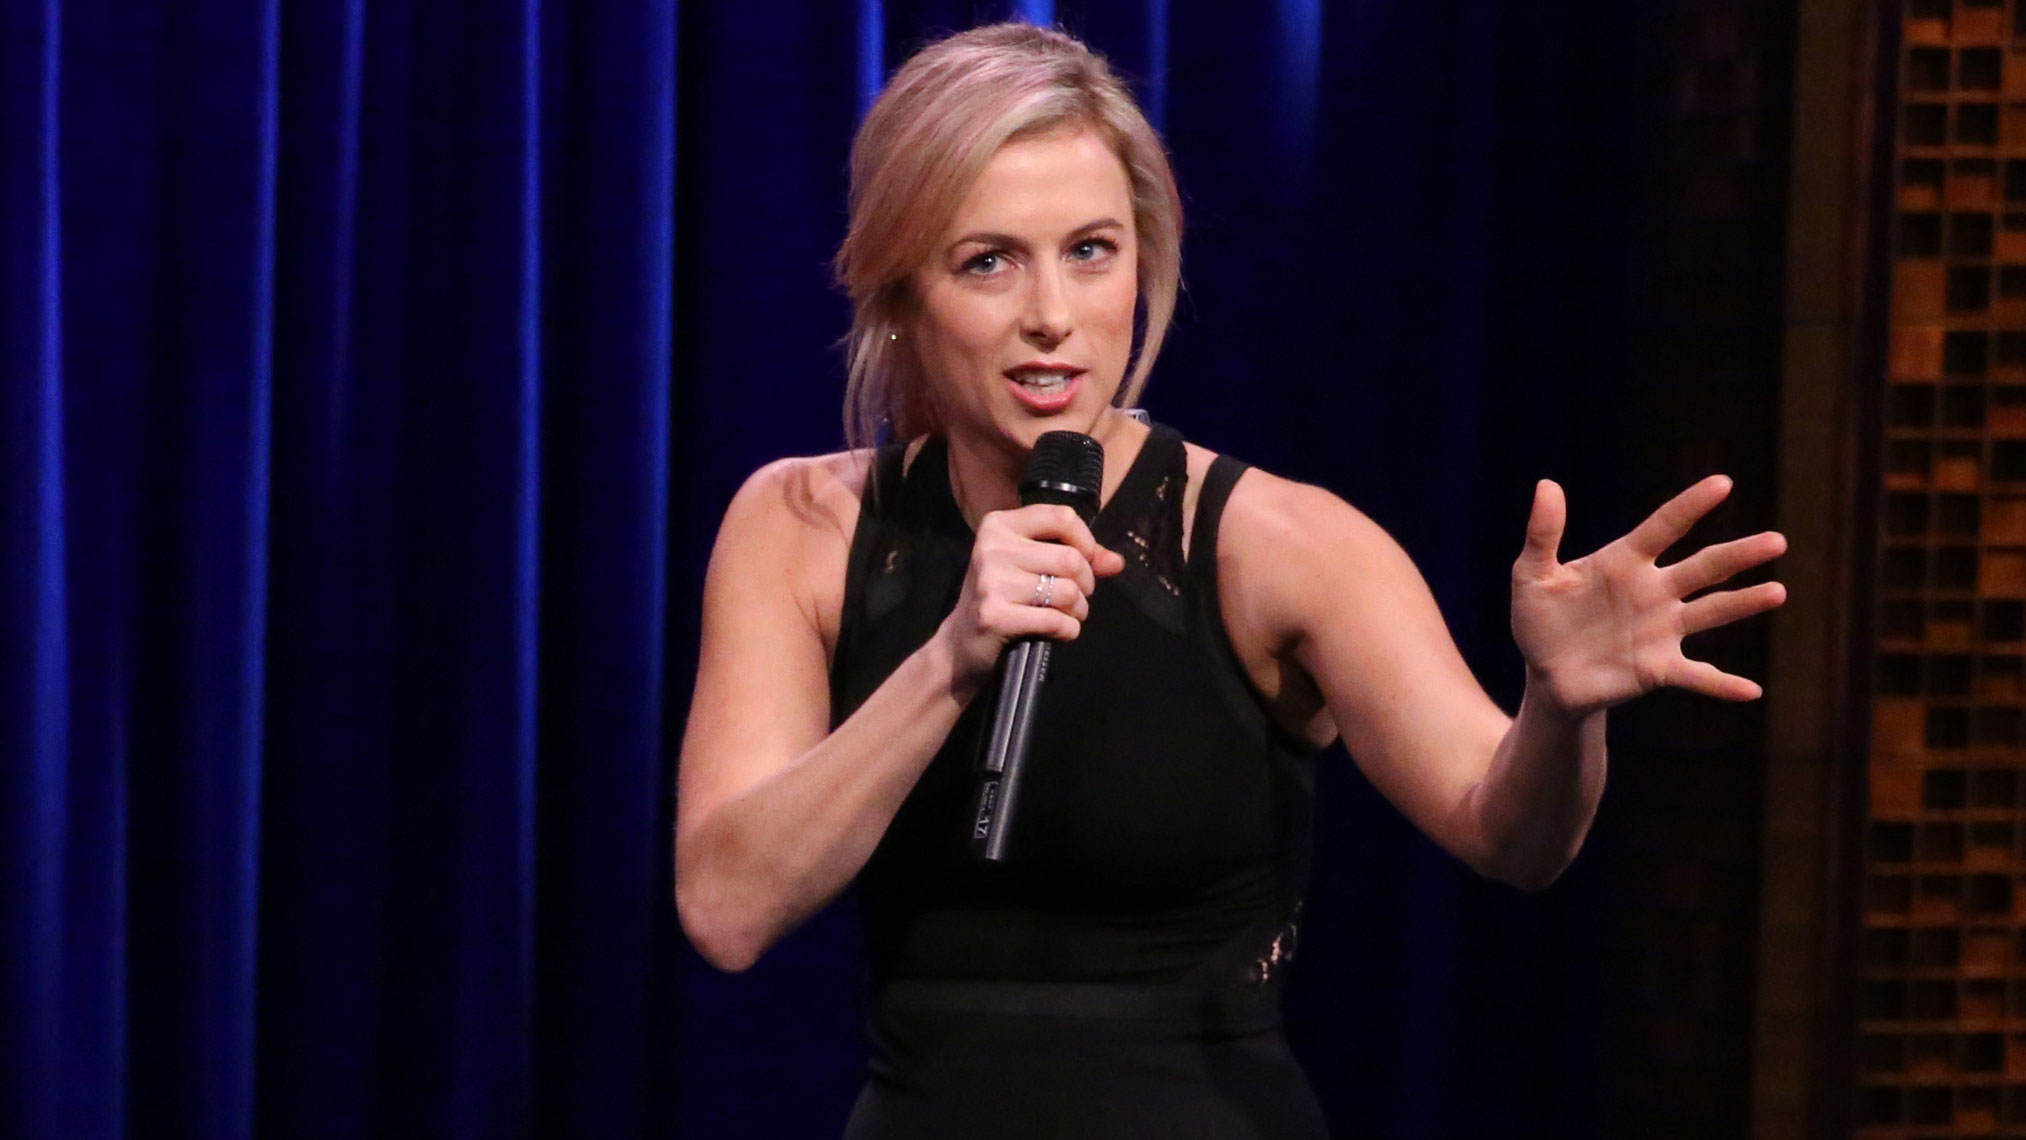 Iliza Shlesinger's third performance on The Tonight Show Starring Jimmy Fallon